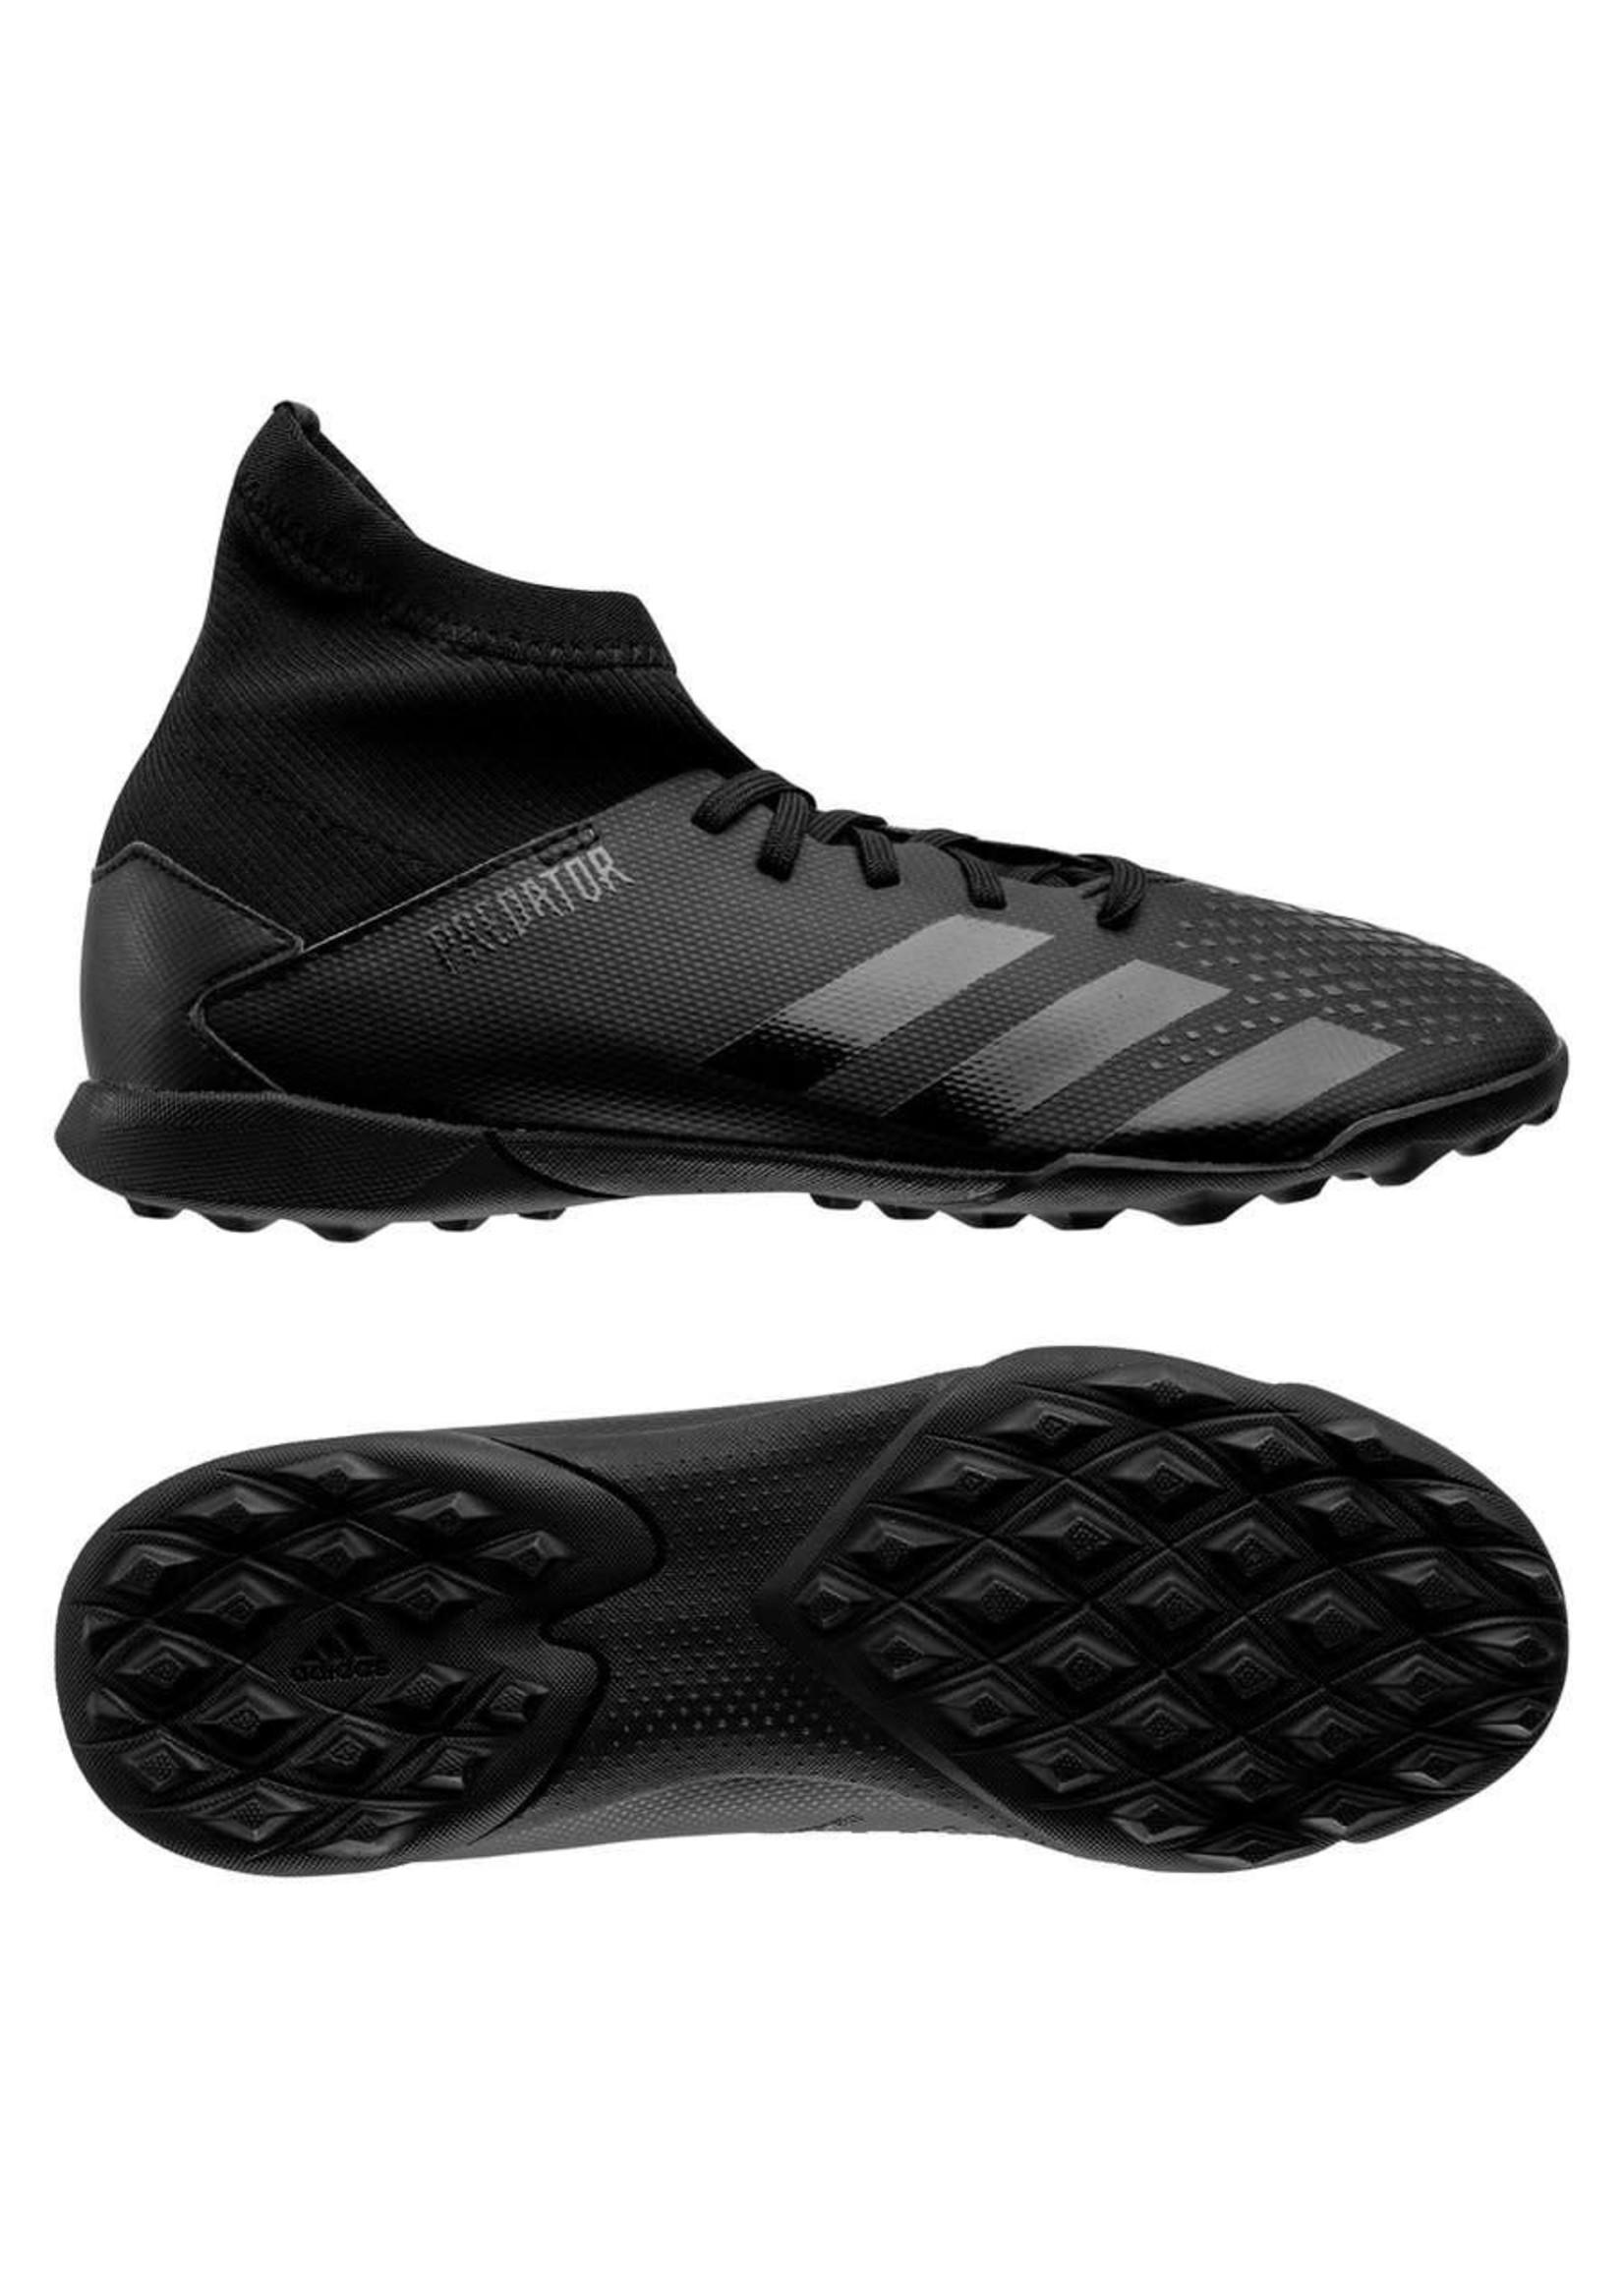 Adidas PREDATOR 20.3 TF JR